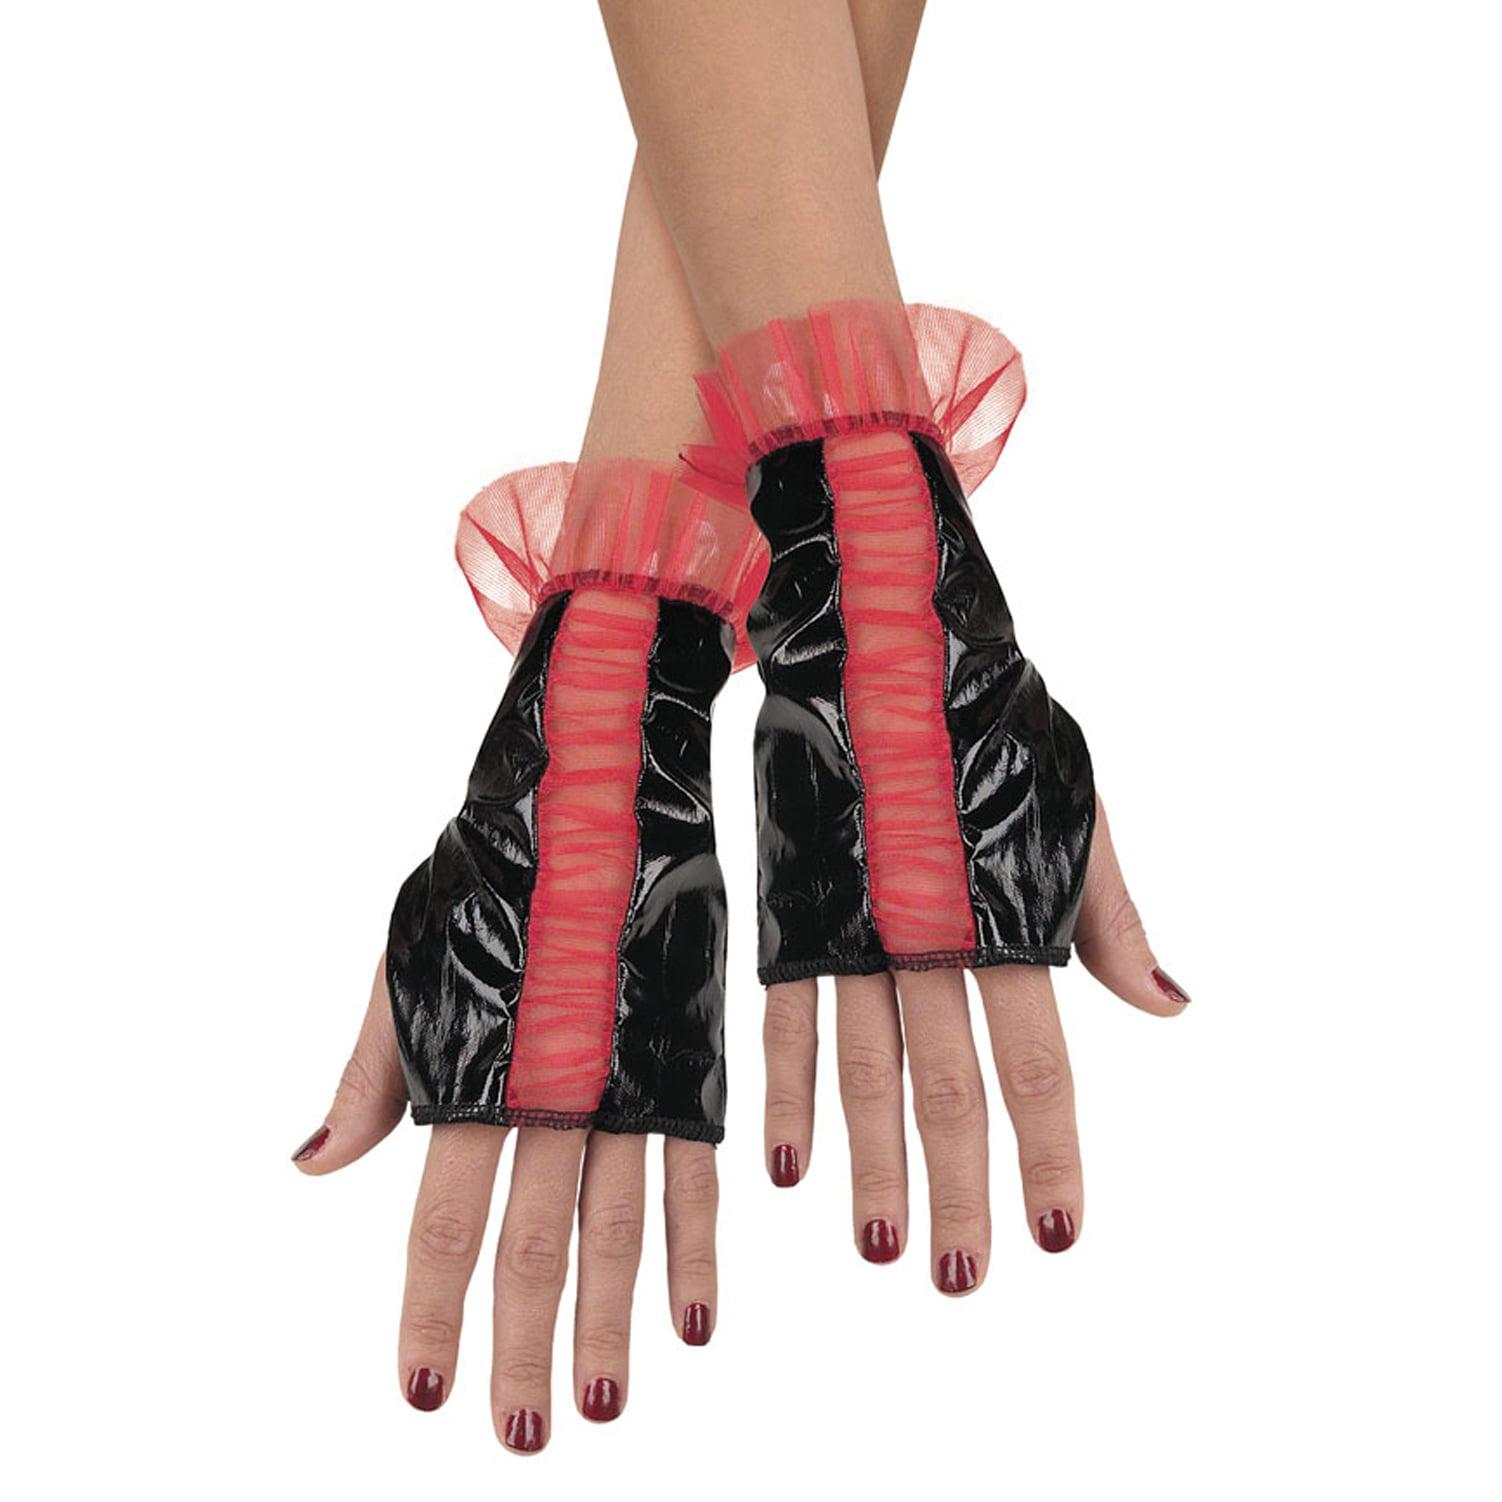 Unique Glovettes Black Red Accents Fingerless Gloves